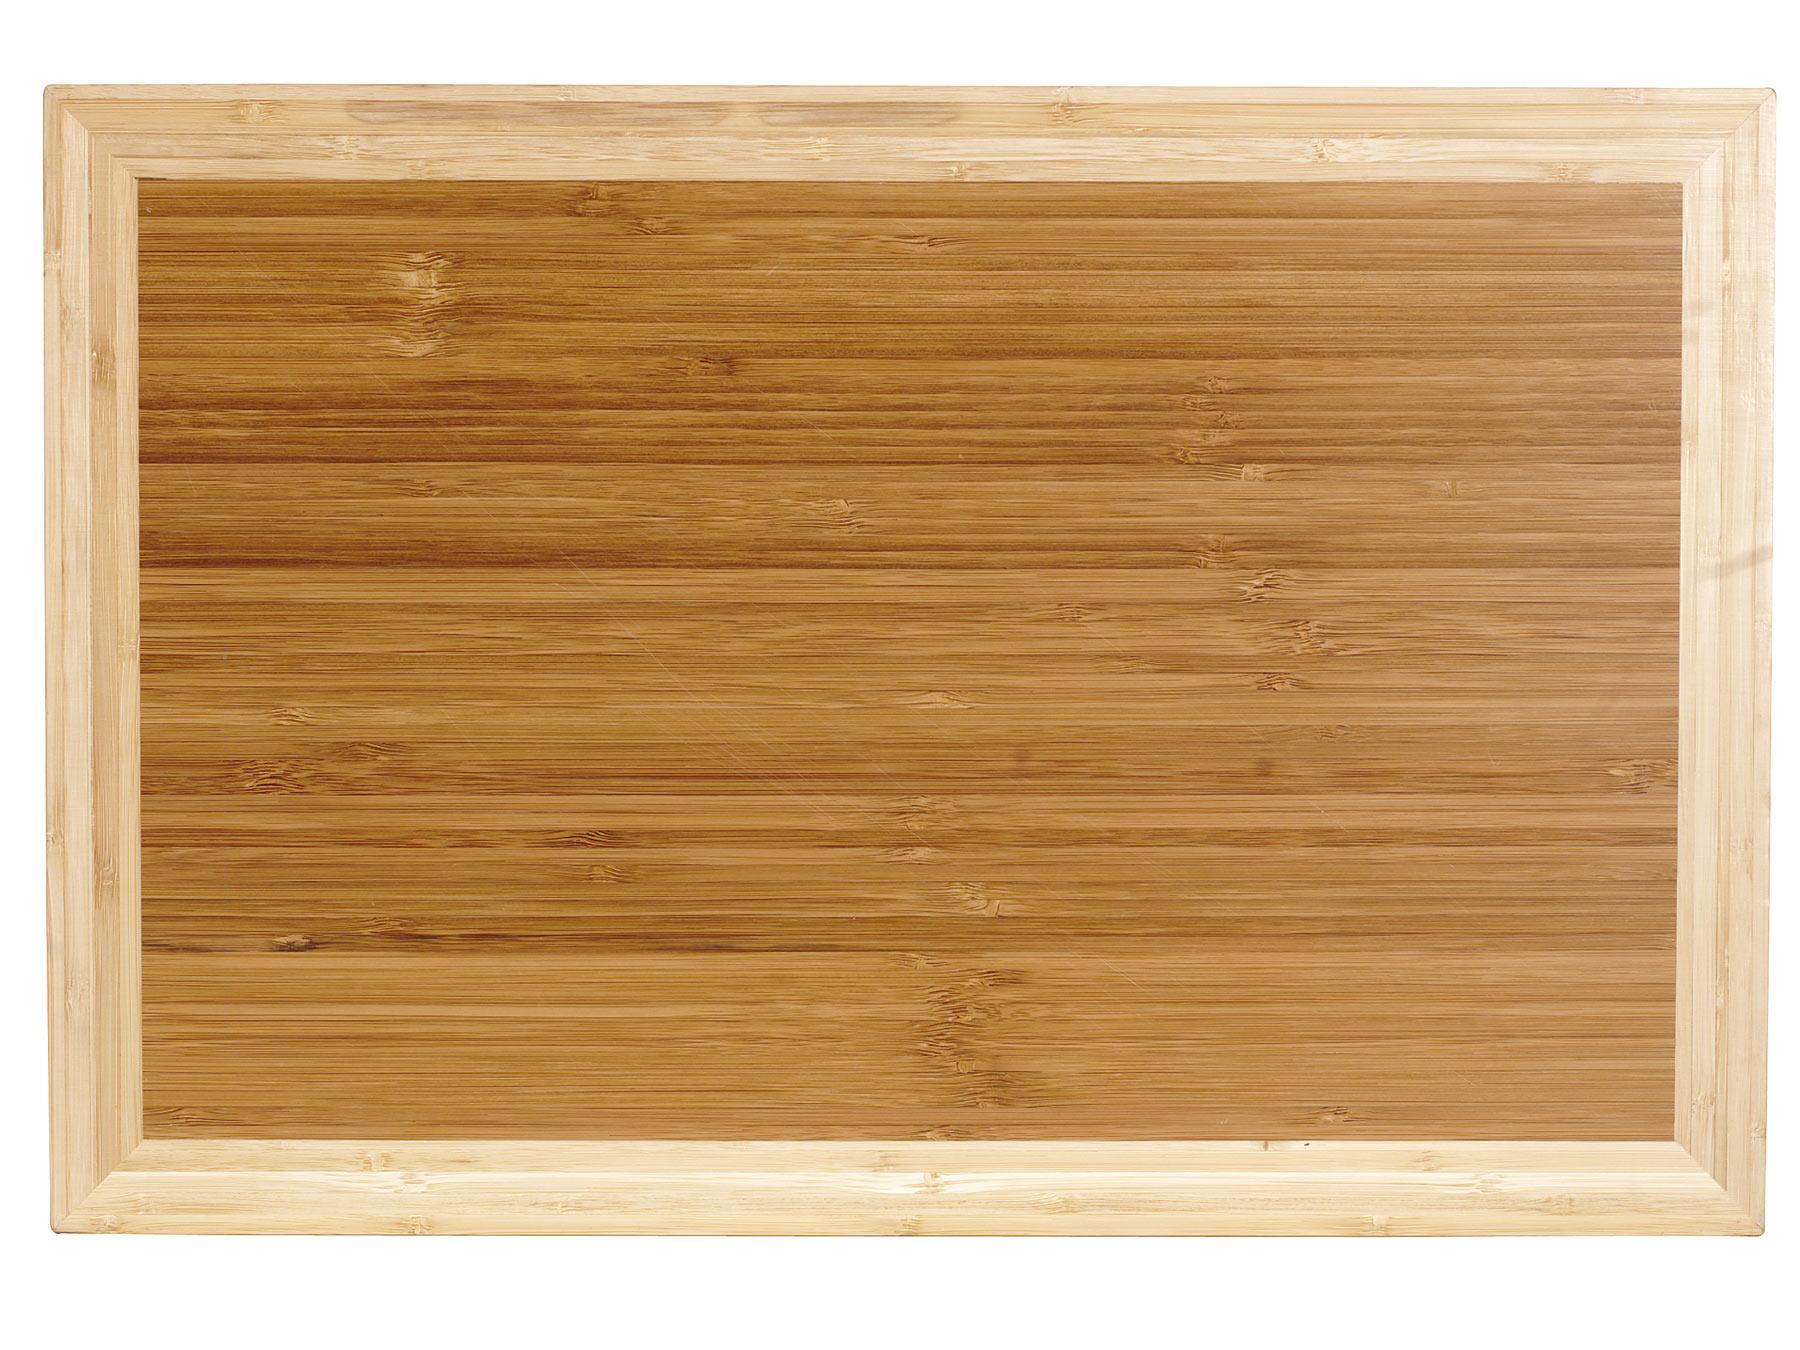 Chroma CB-01 Butcher Board Bambus